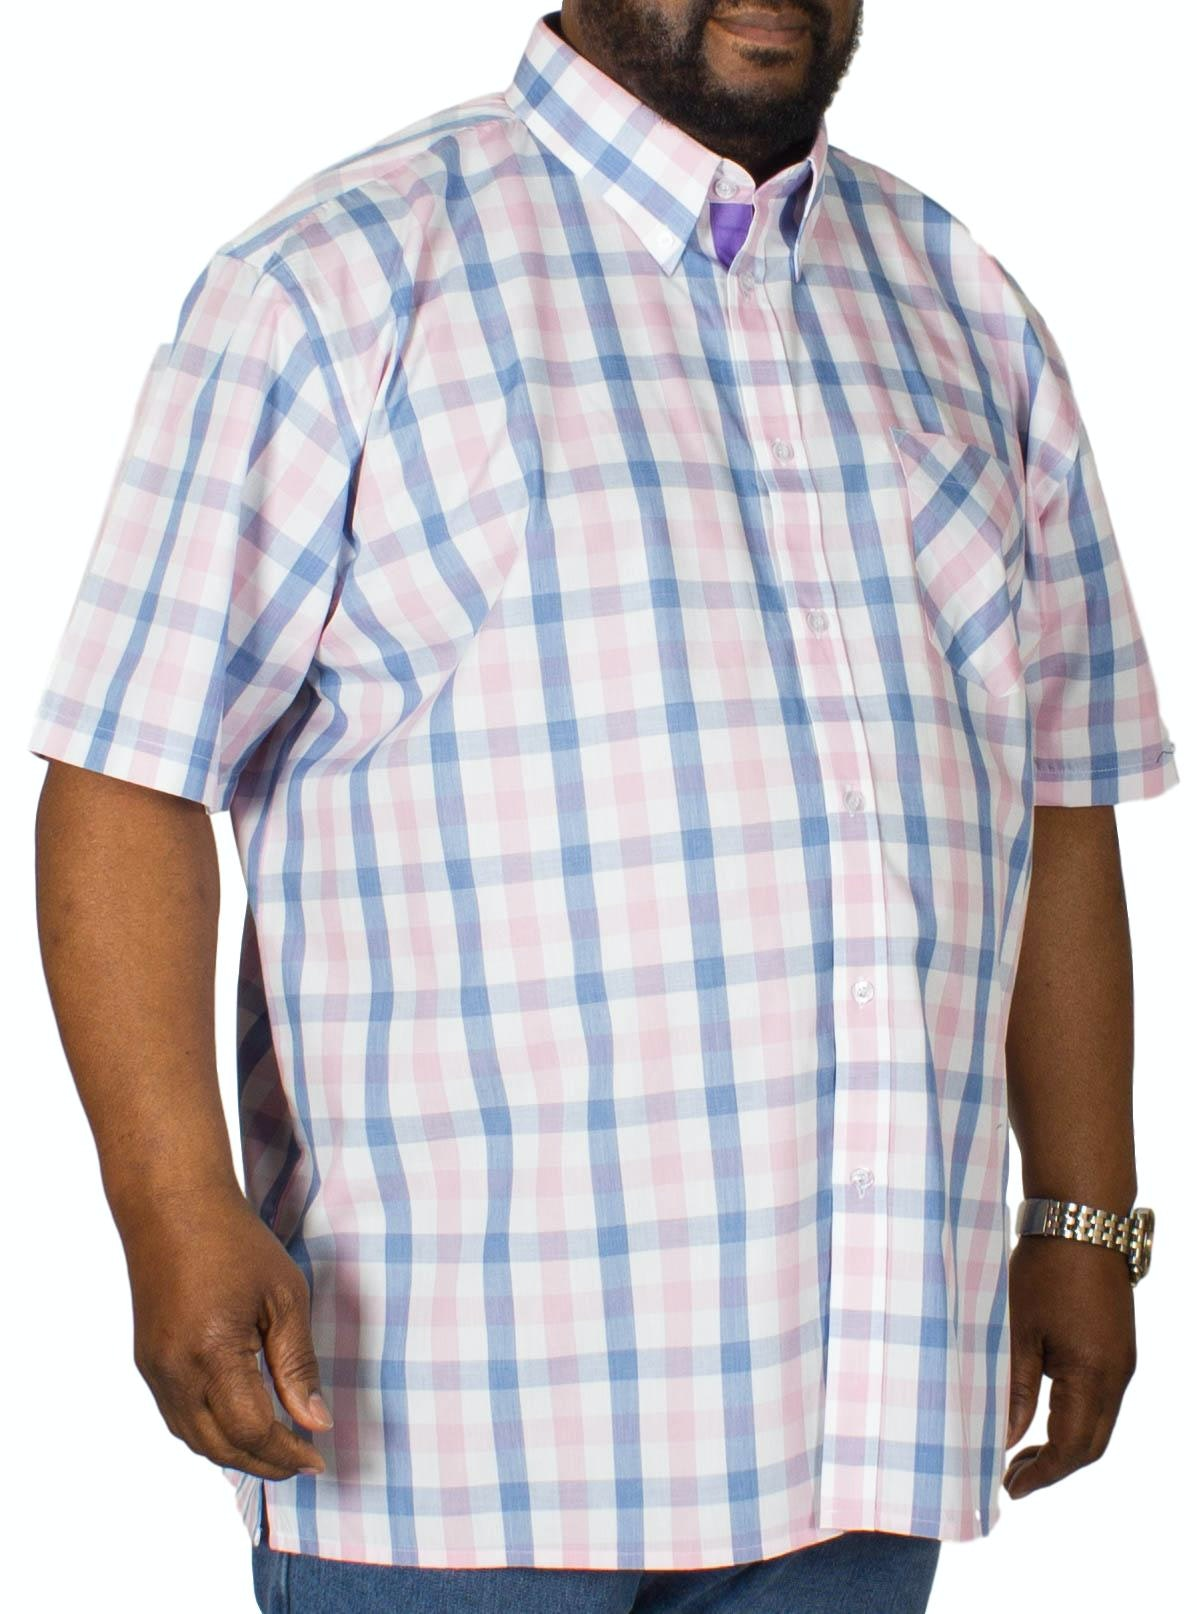 KAM Check Short Sleeved Shirt Blue/Pink